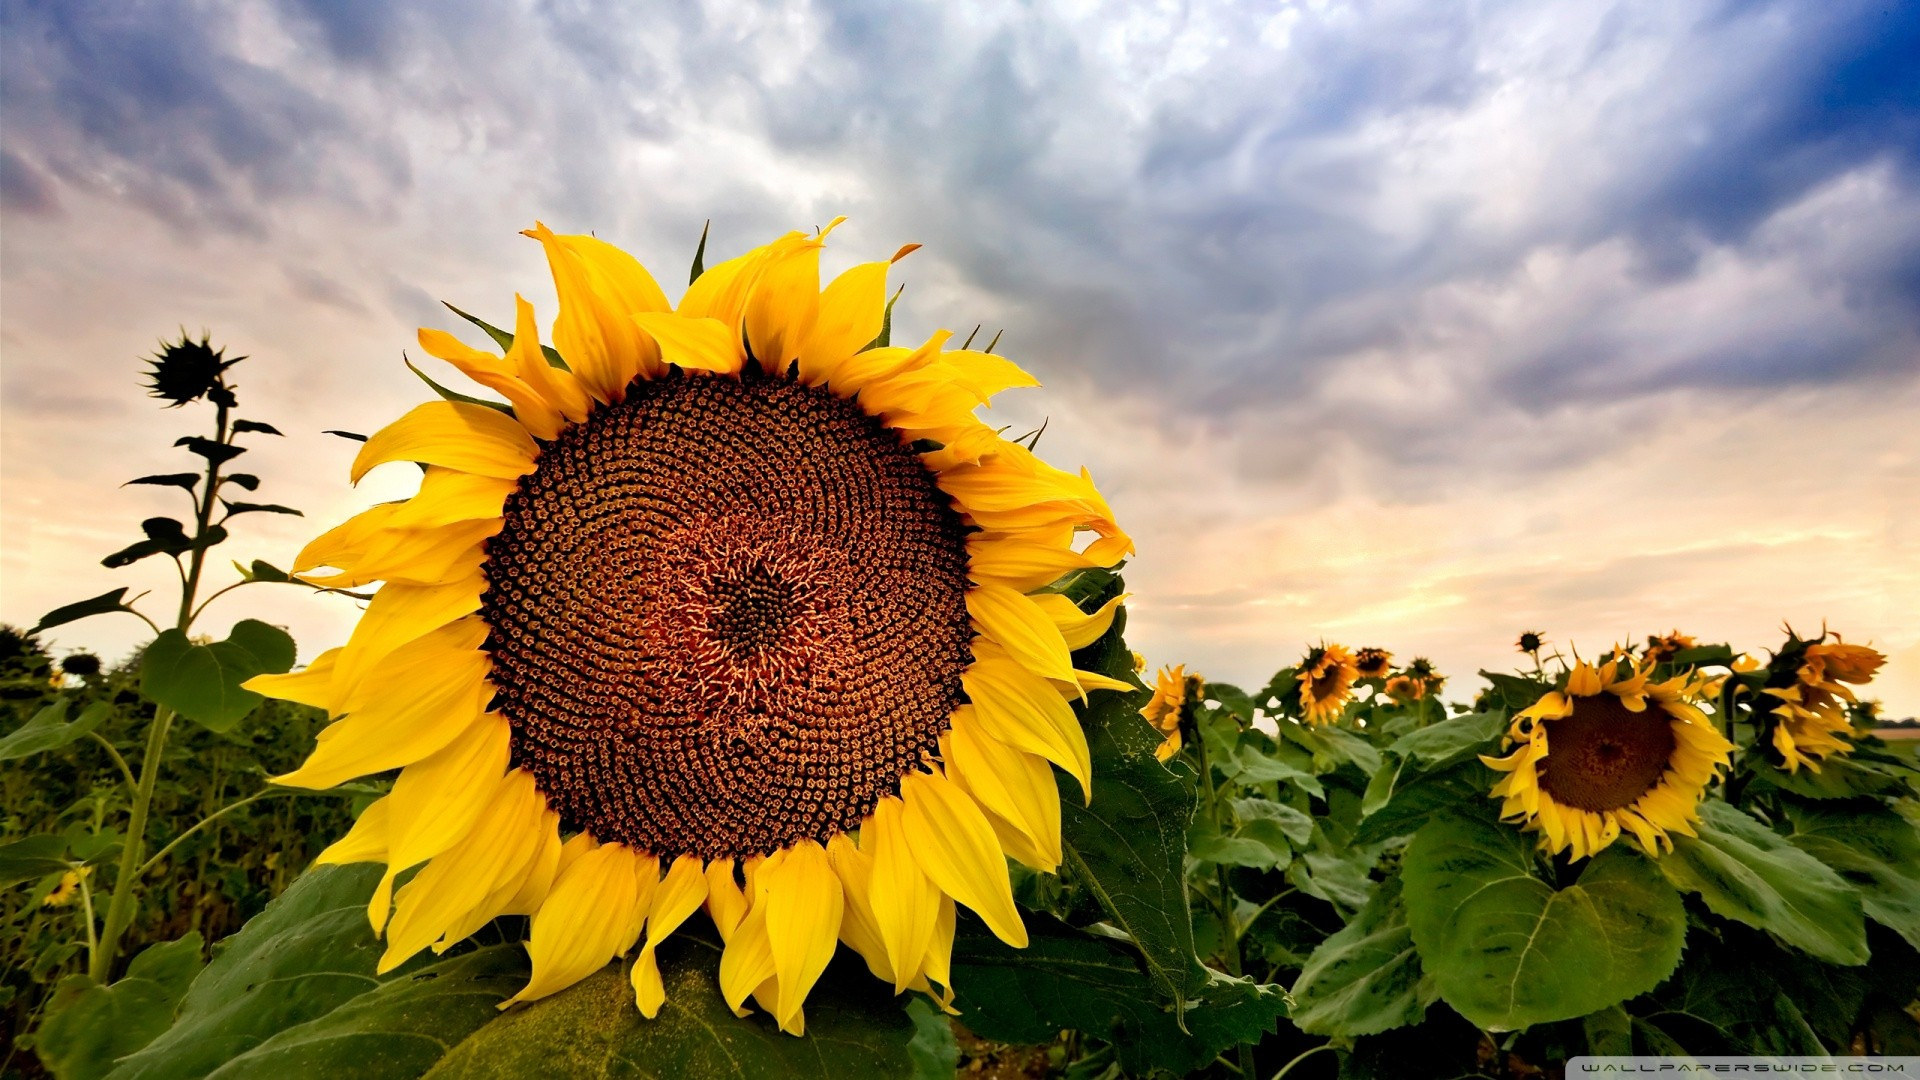 sunflower 8 wallpaper 1920x1080 - photo #3